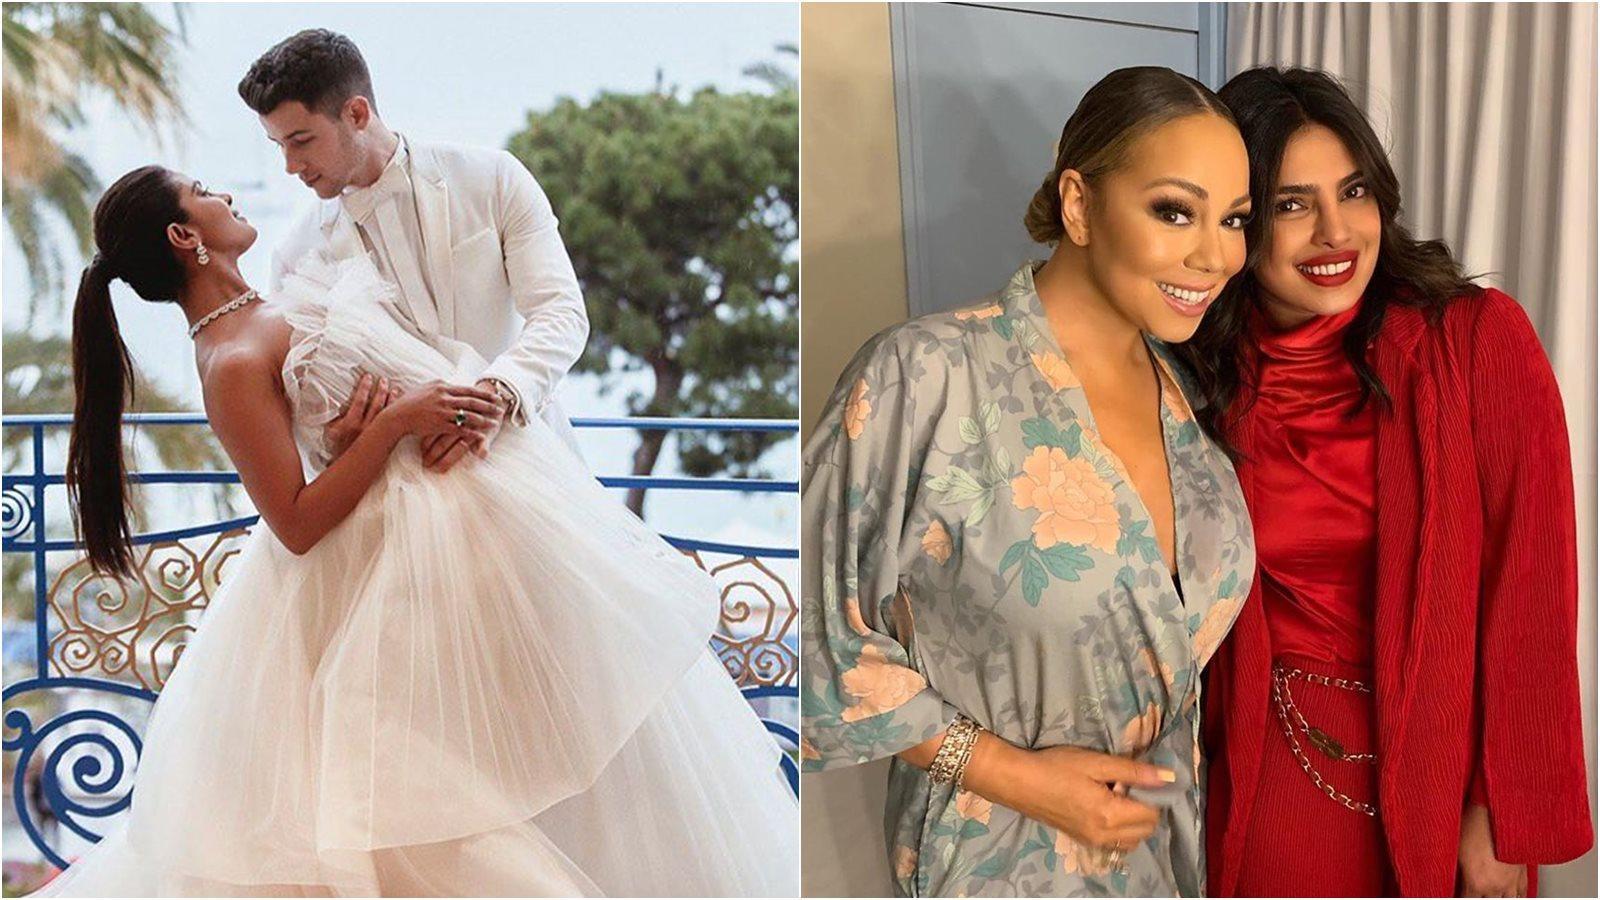 Priyanka Chopra and Nick Jonas celebrate first date anniversary apart,  hubby plans special surprise for PeeCee